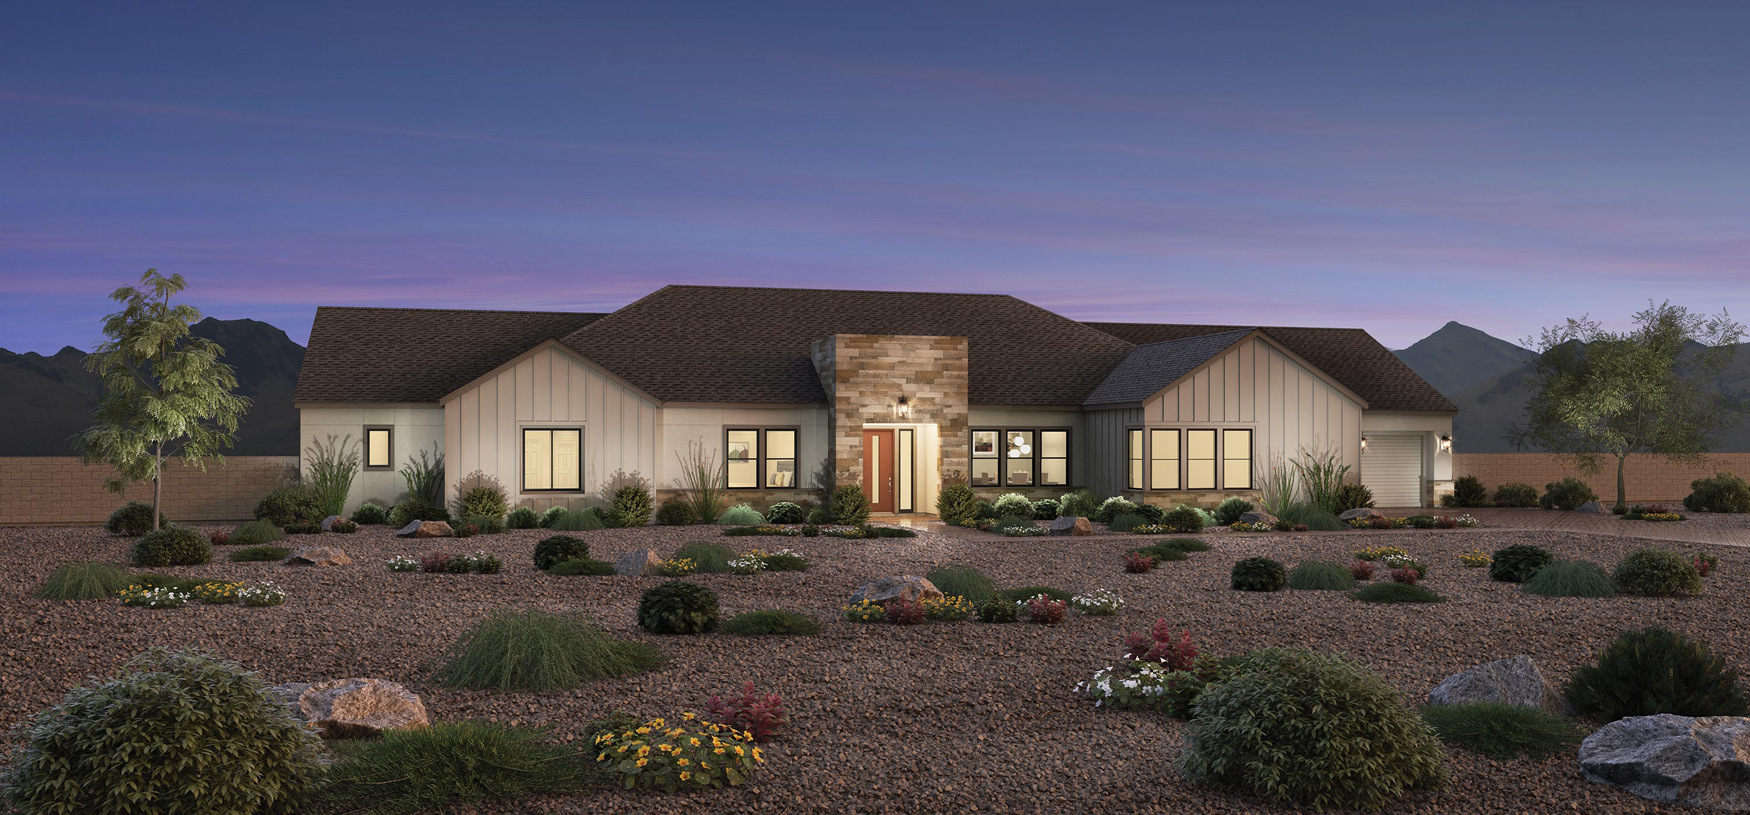 Ridgewood -  Modern Farmhouse